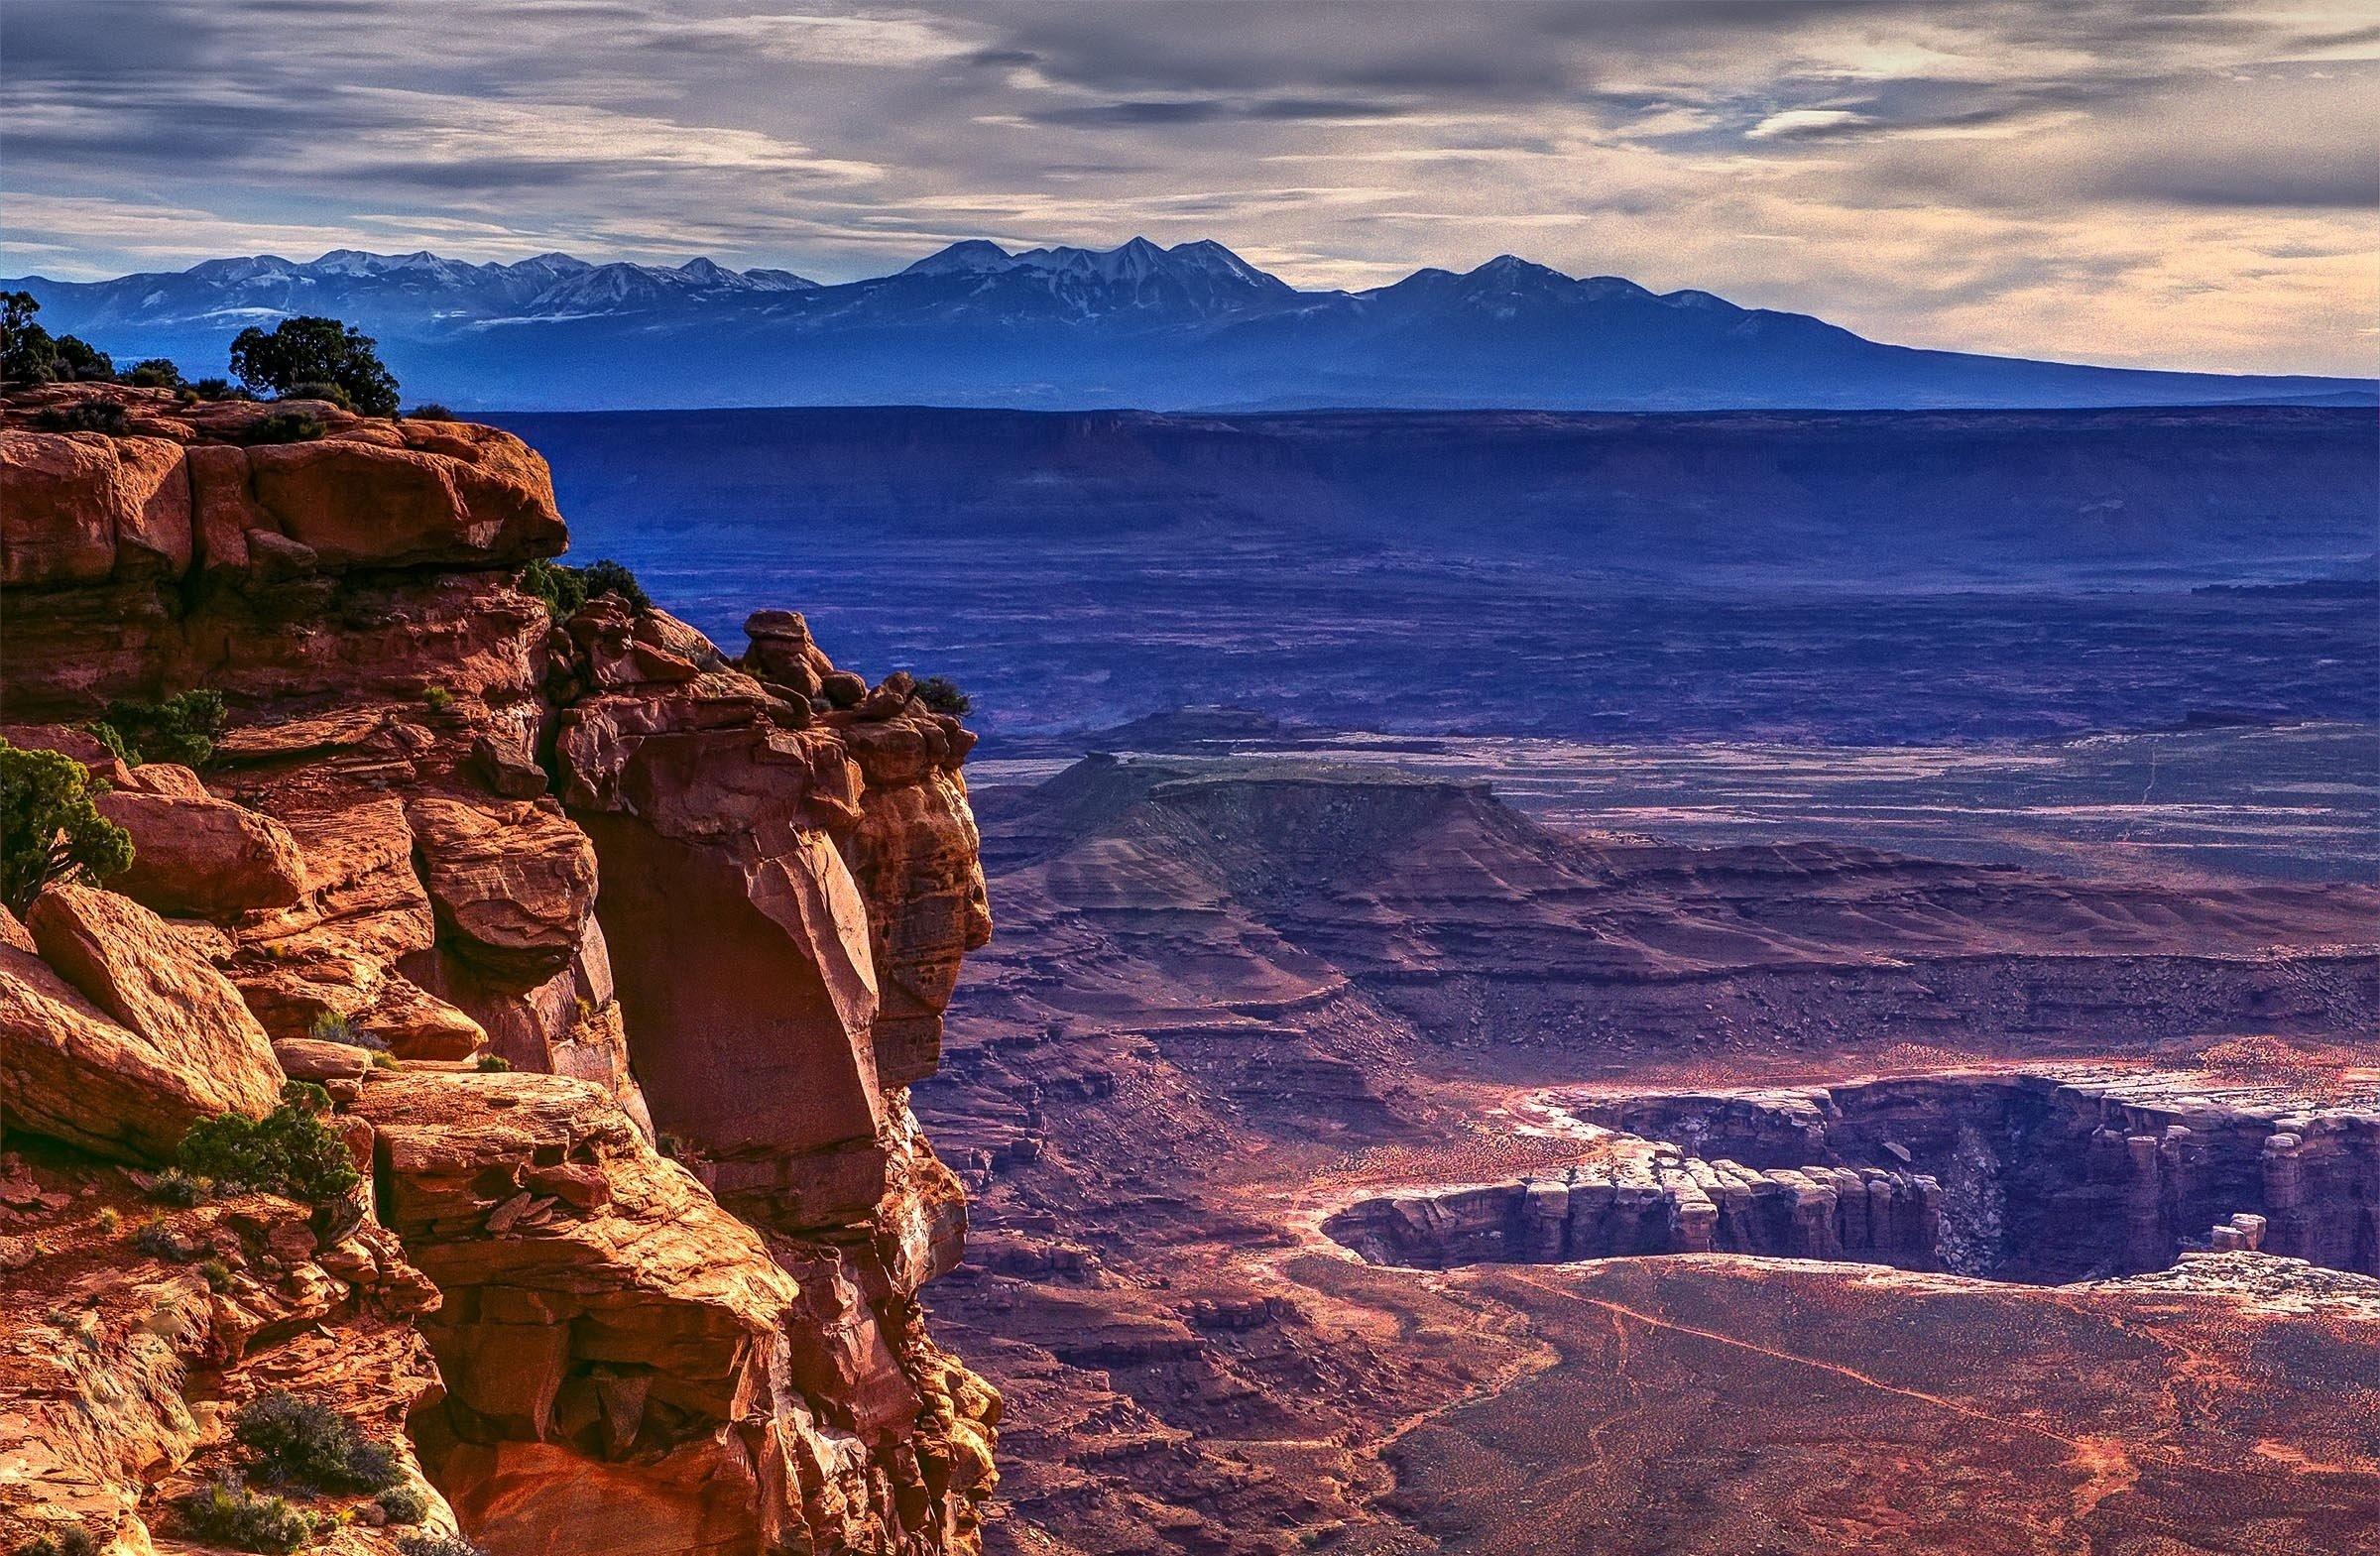 Canyonlands National Park near Moab Utah desert landscape mountains 2400x1569